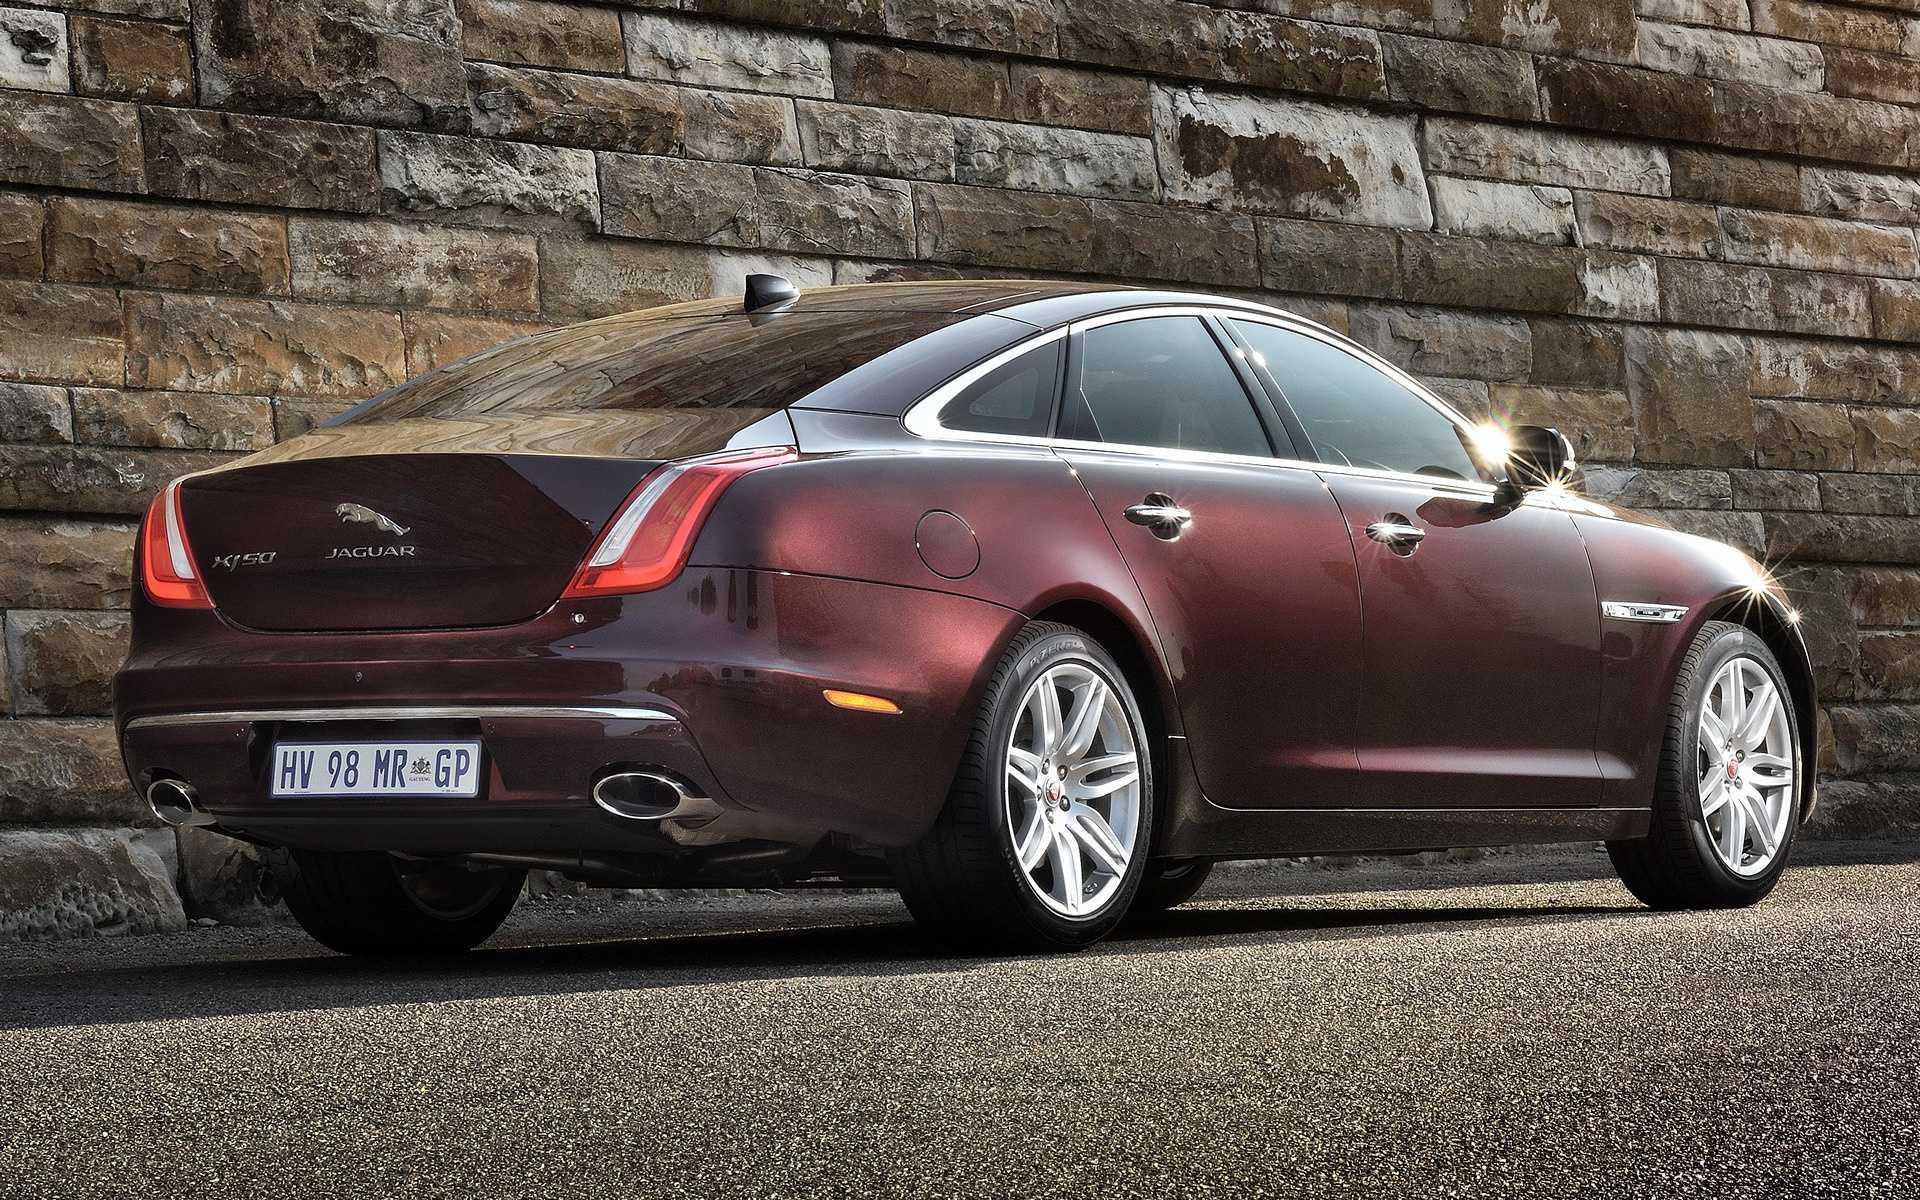 Jaguar xj 3.0 td at premium luxury lwb (02.2016 - н.в.) - технические характеристики